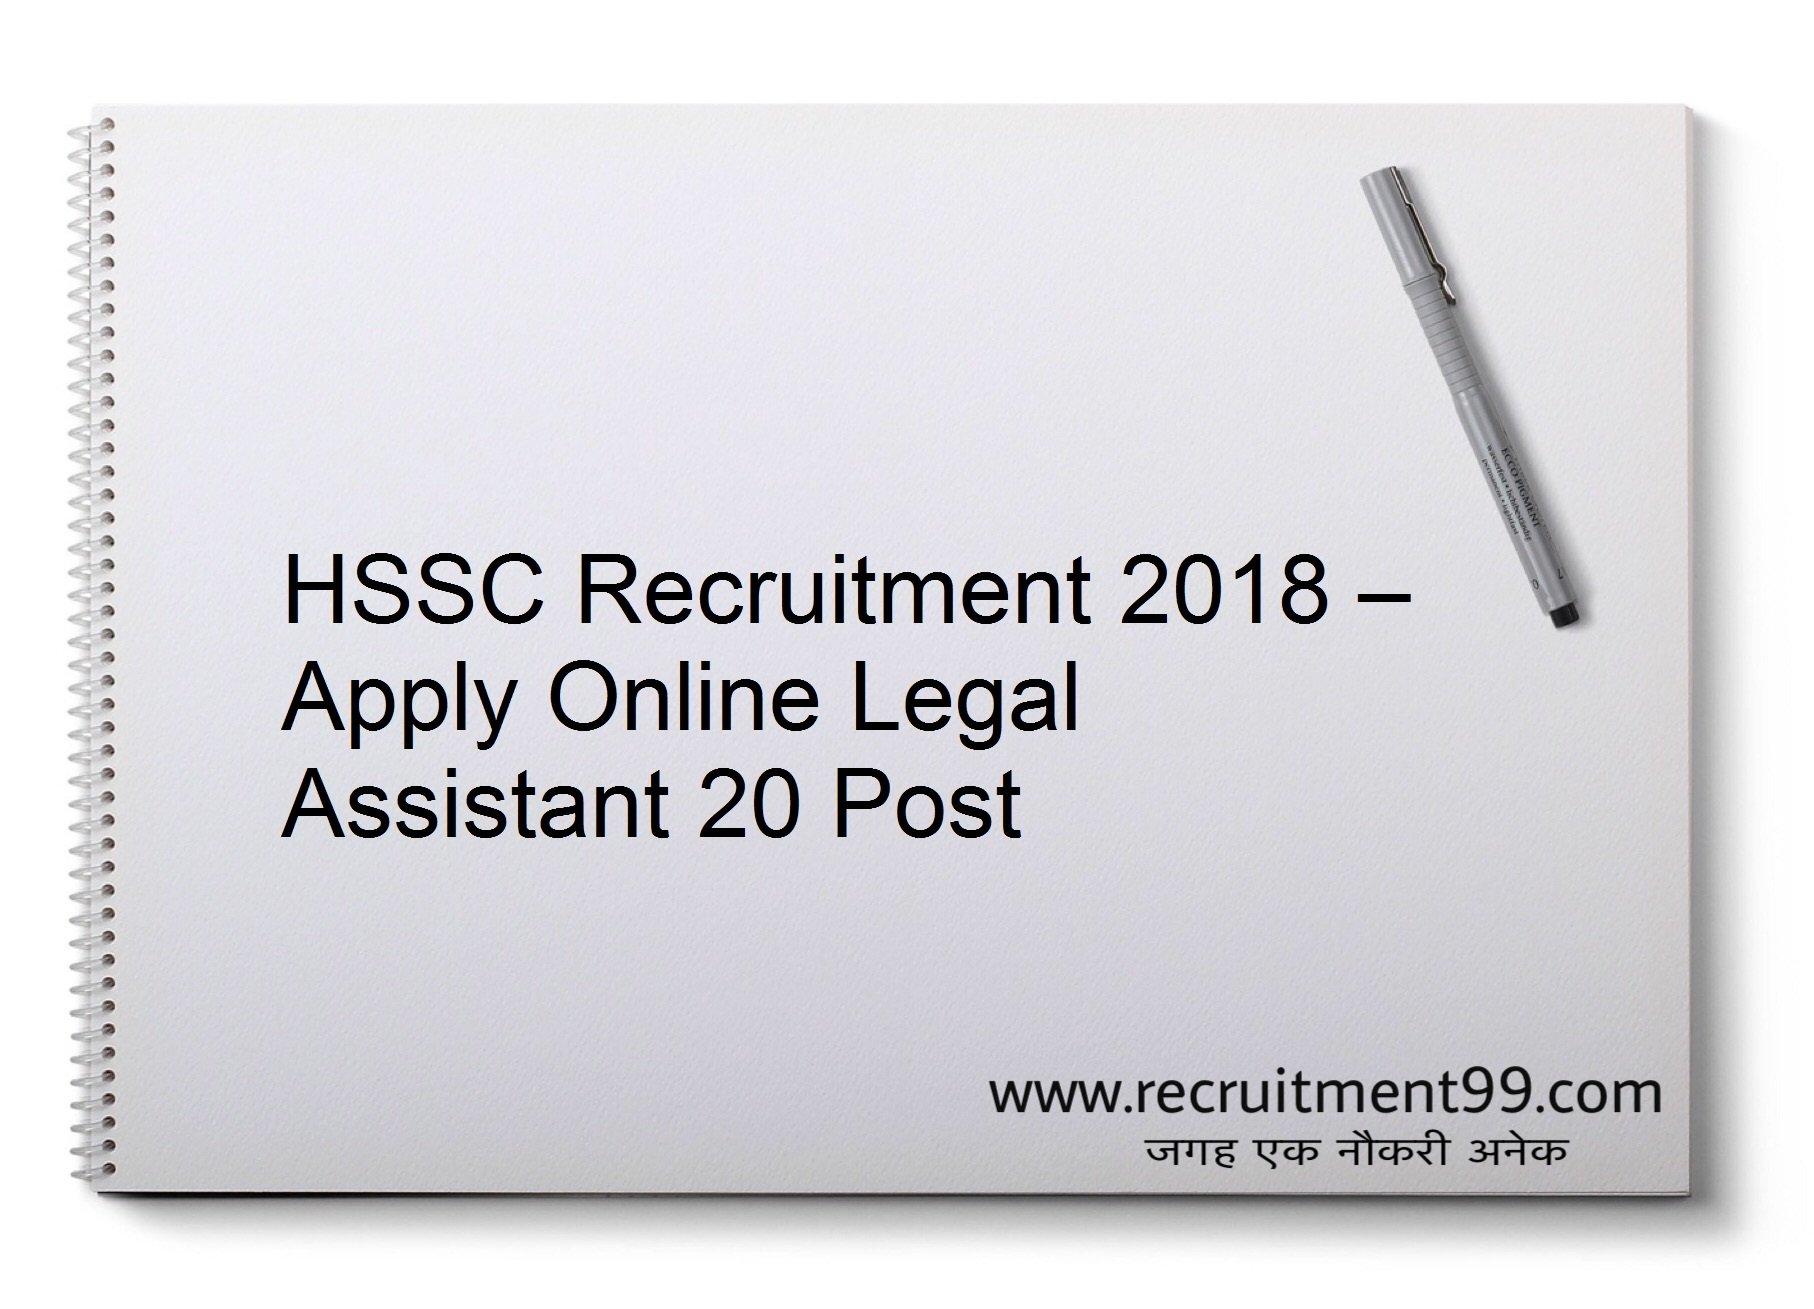 HSSC Legal Assistant Recruitment 2018. Admit Card Results 2018